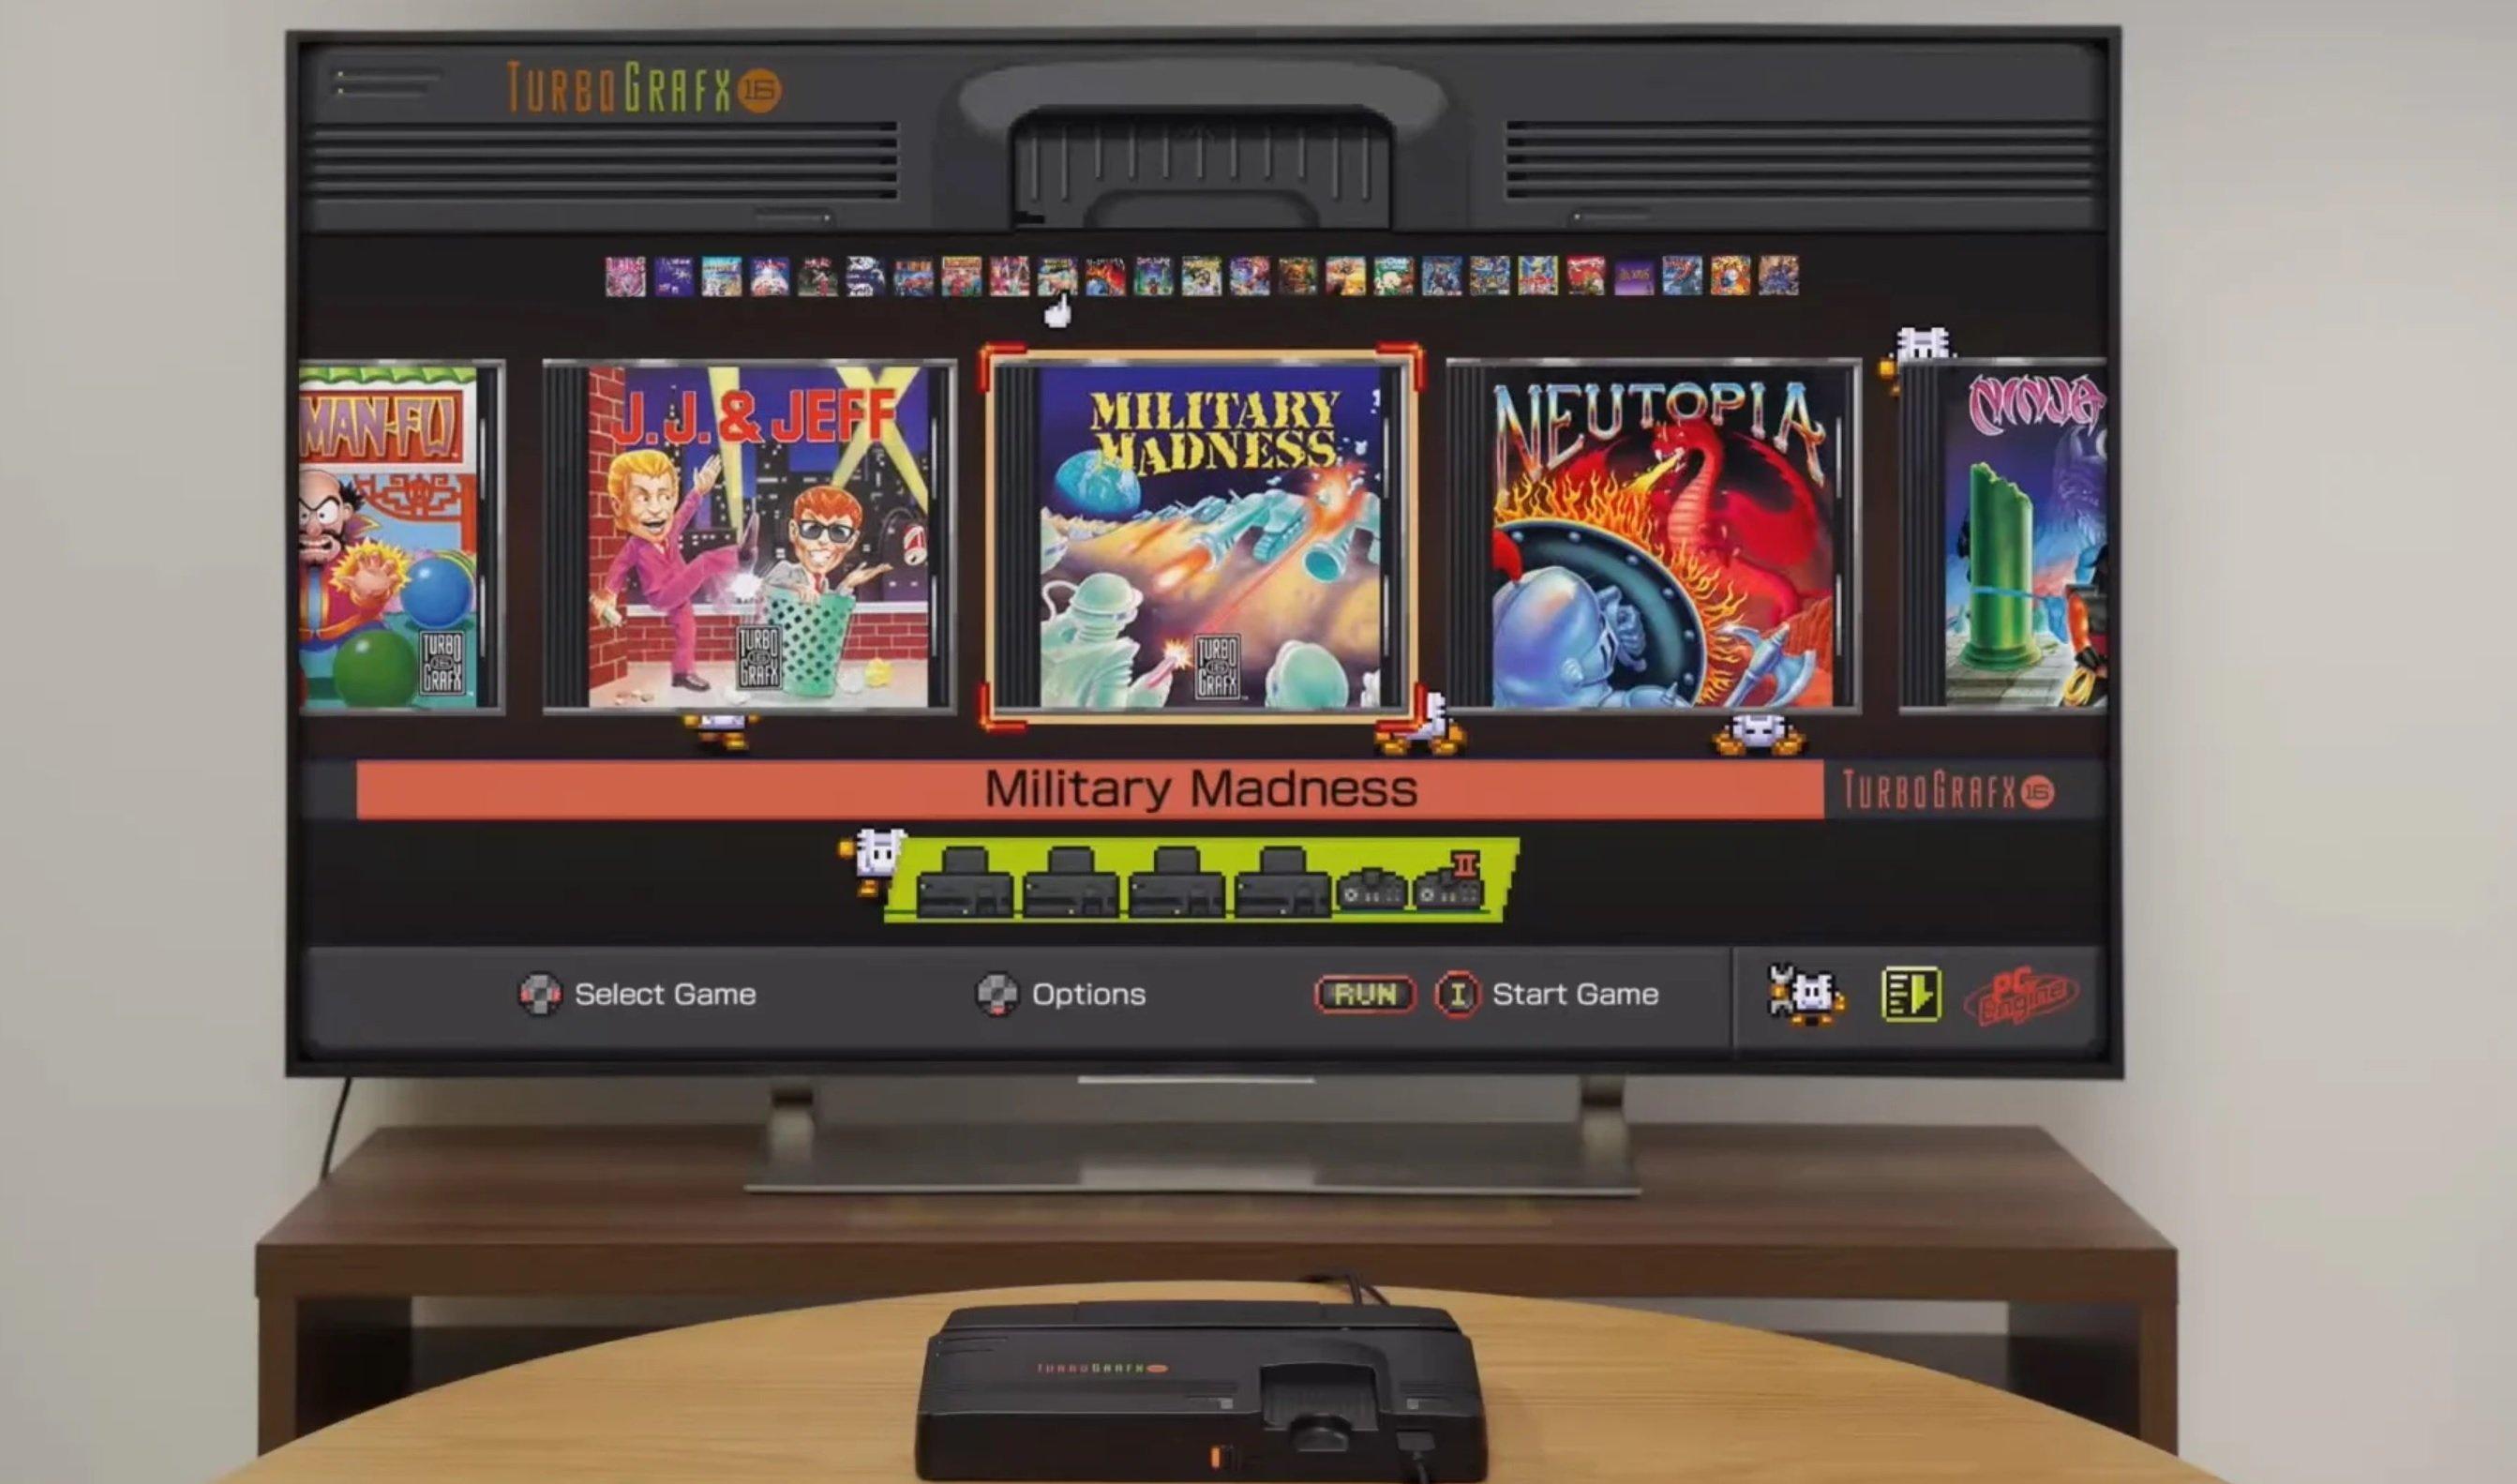 TurboGrafx-16 Mini menu interface